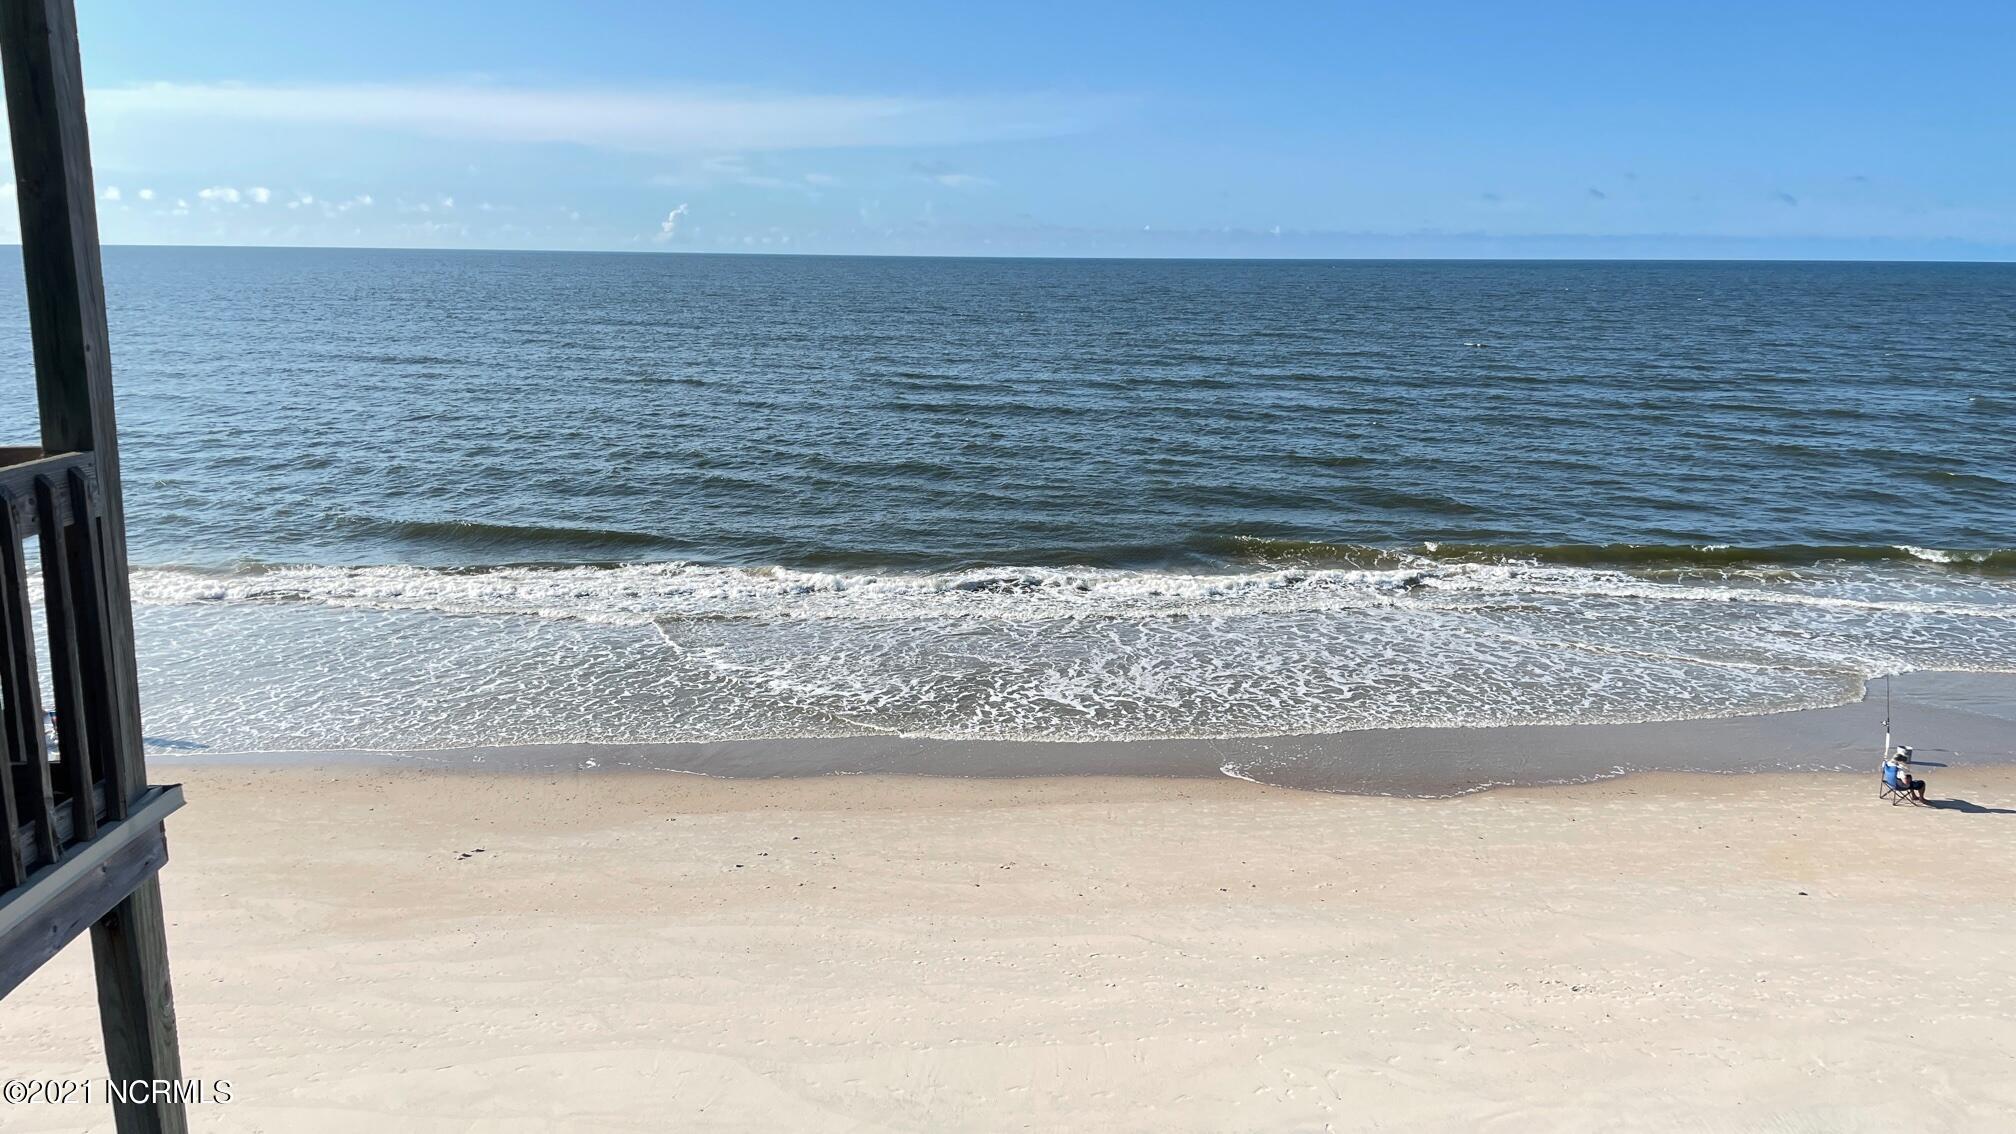 2224 New River Inlet Road, North Topsail Beach, North Carolina 28460, 1 Bedroom Bedrooms, 3 Rooms Rooms,1 BathroomBathrooms,Condominium,For sale,New River Inlet,100285990